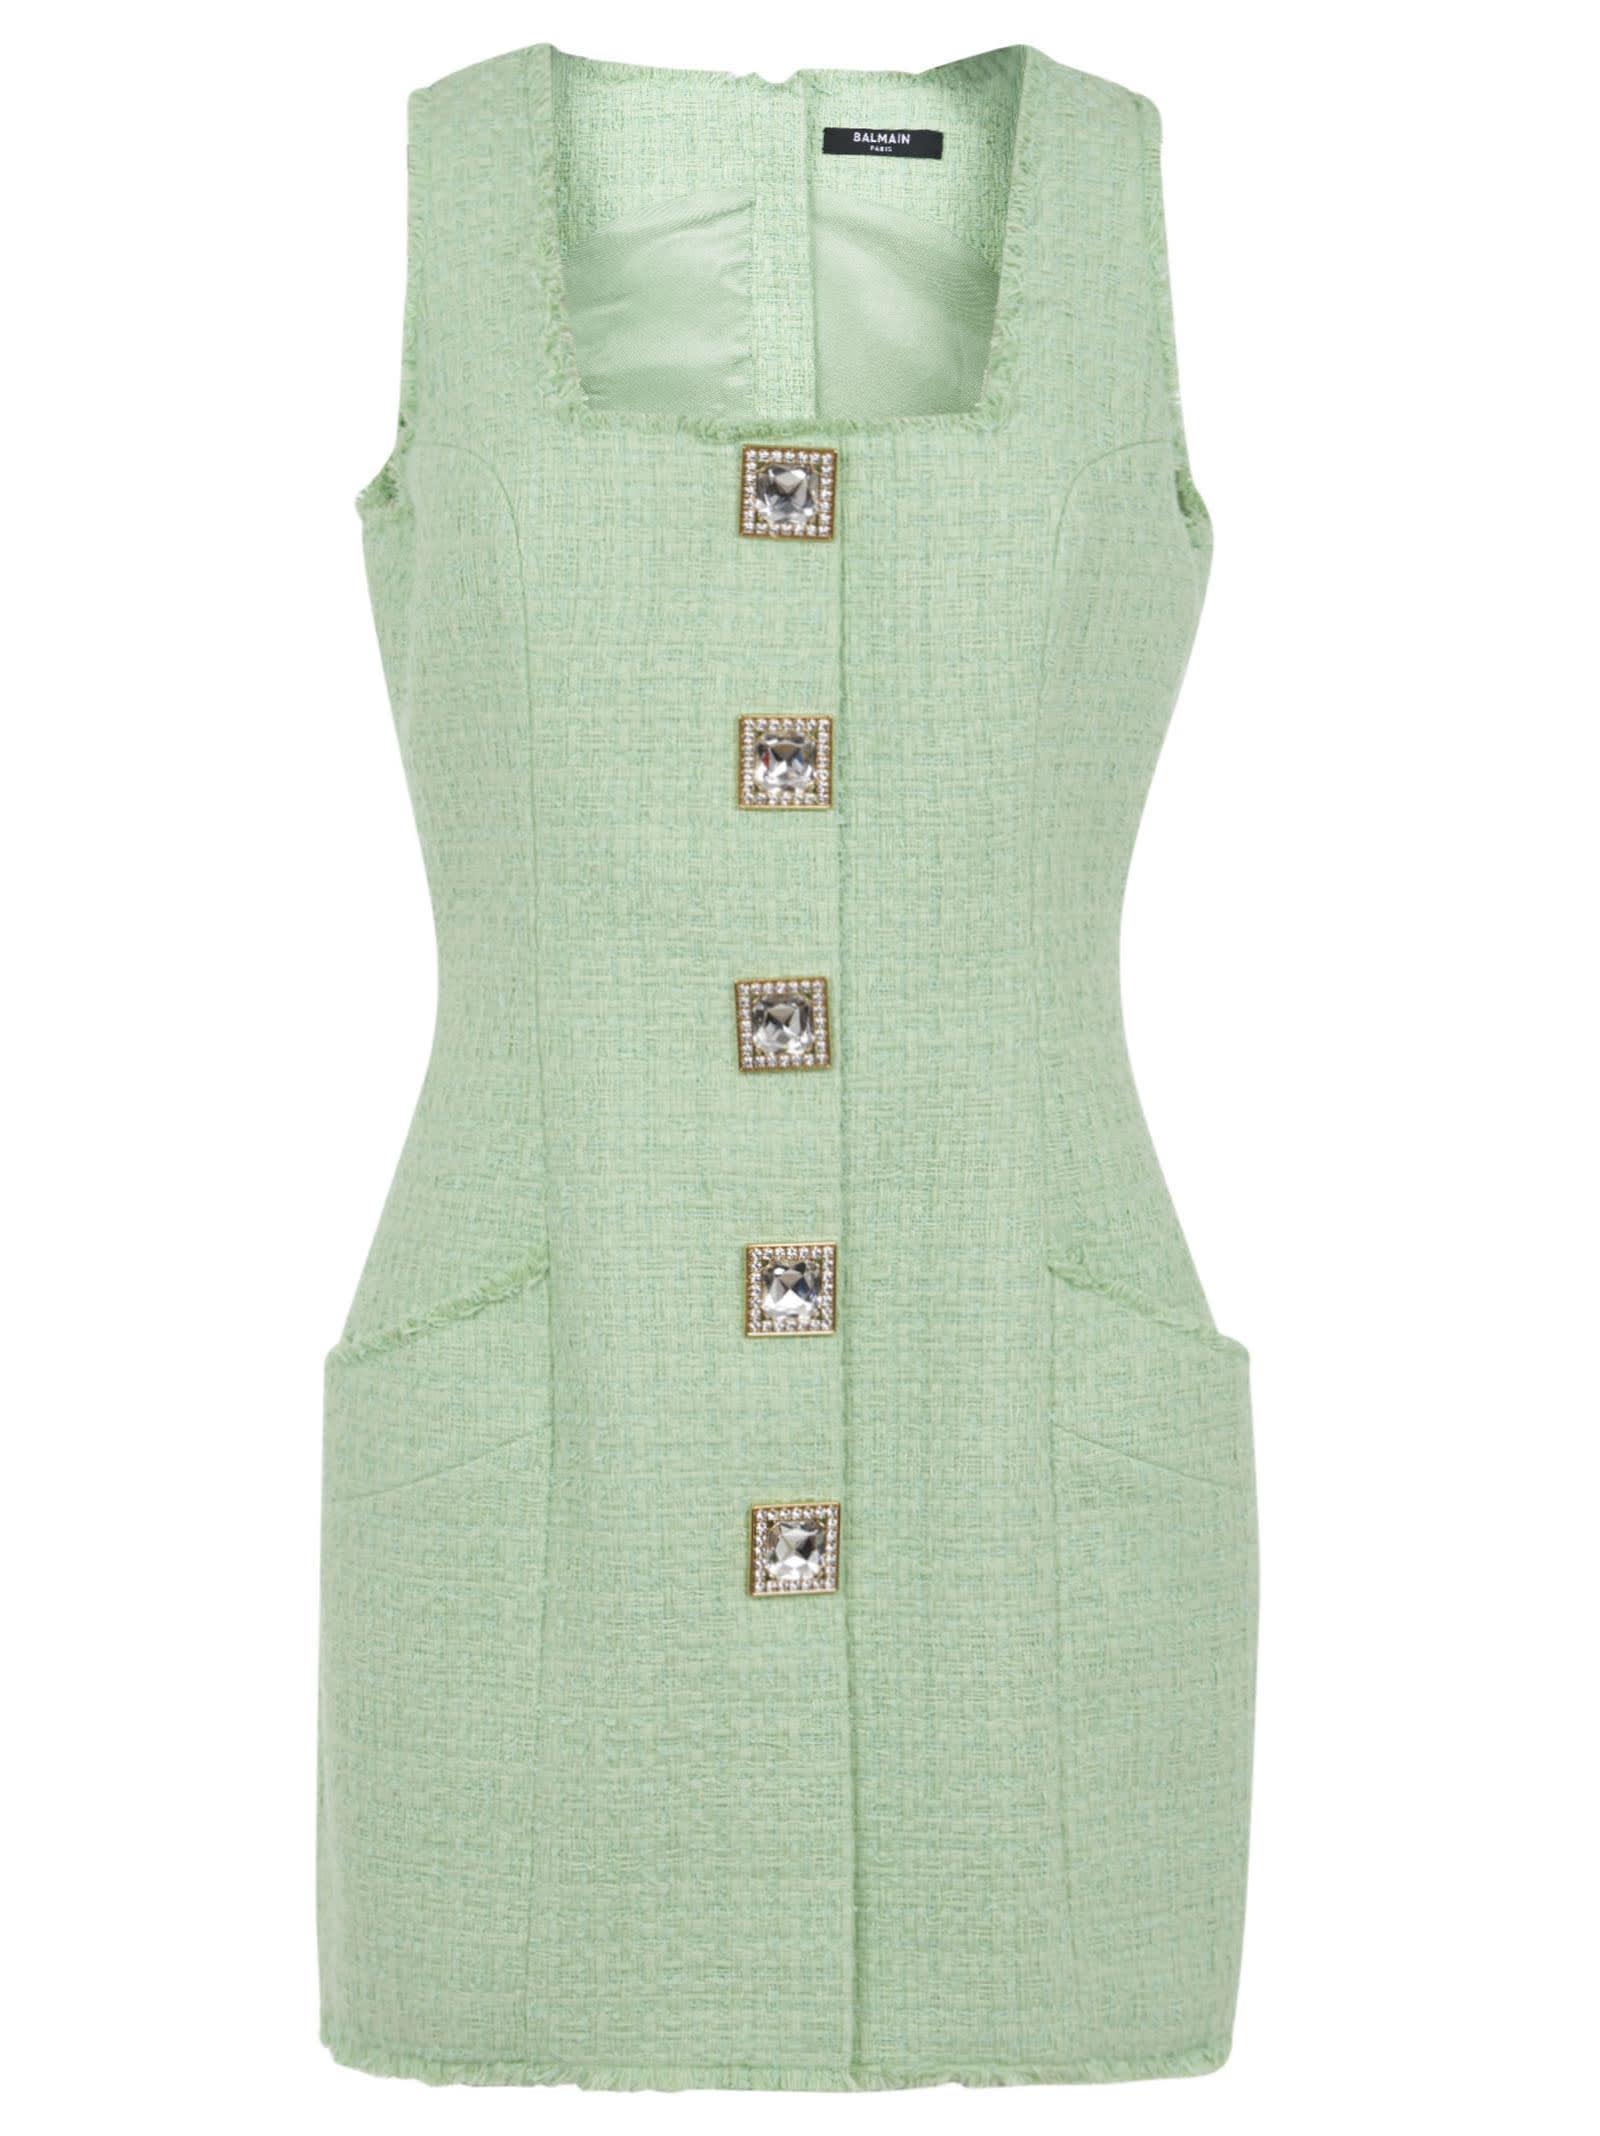 Balmain SQUARE BUTTON DETAIL SLEEVELESS DRESS